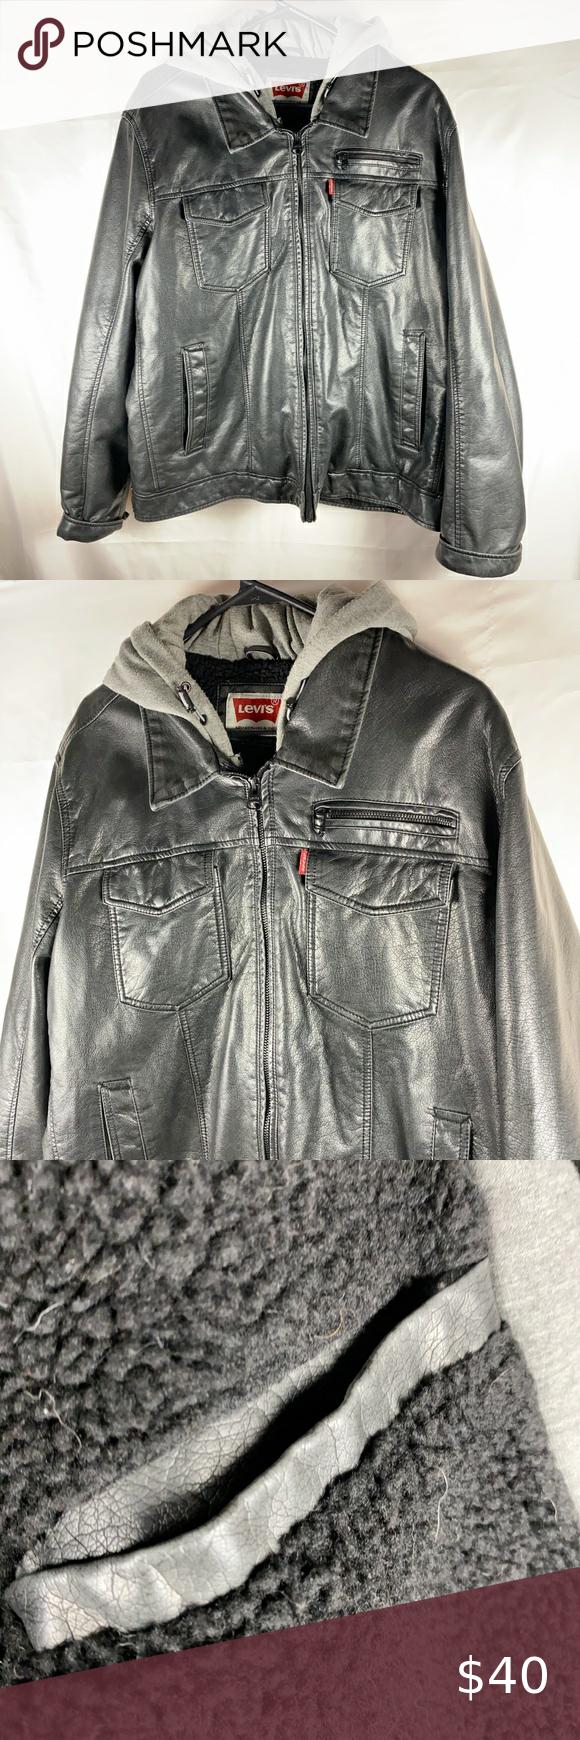 Levi S Men S Jacket Size Medium In 2020 Clothes Design Fashion Design Fashion Tips [ 1740 x 580 Pixel ]